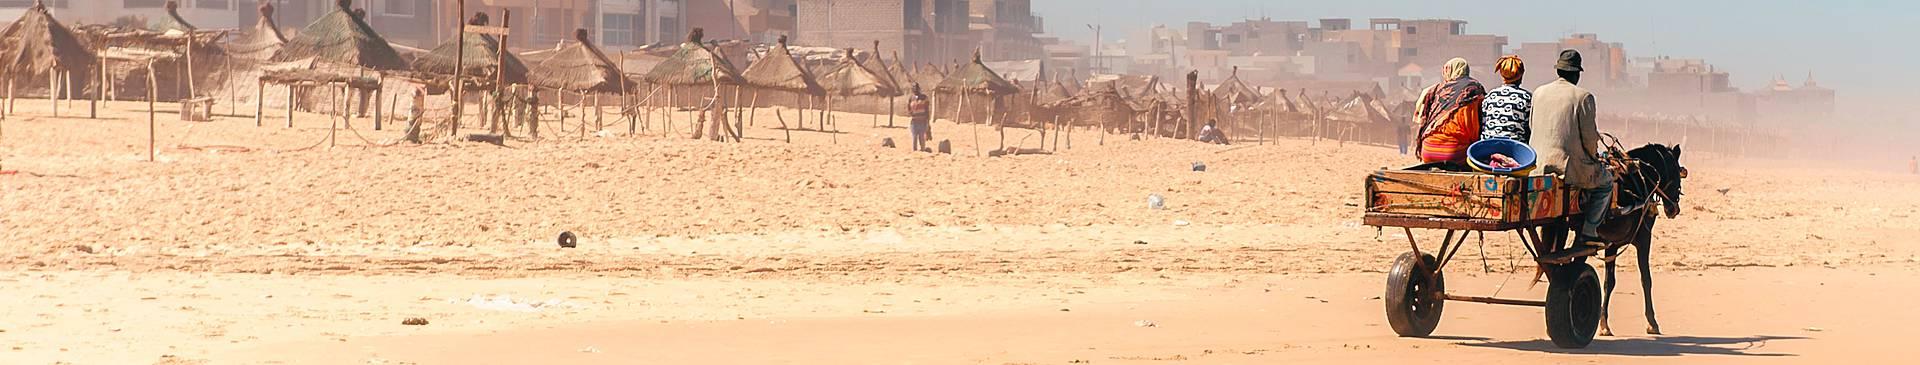 Playas de Senegal